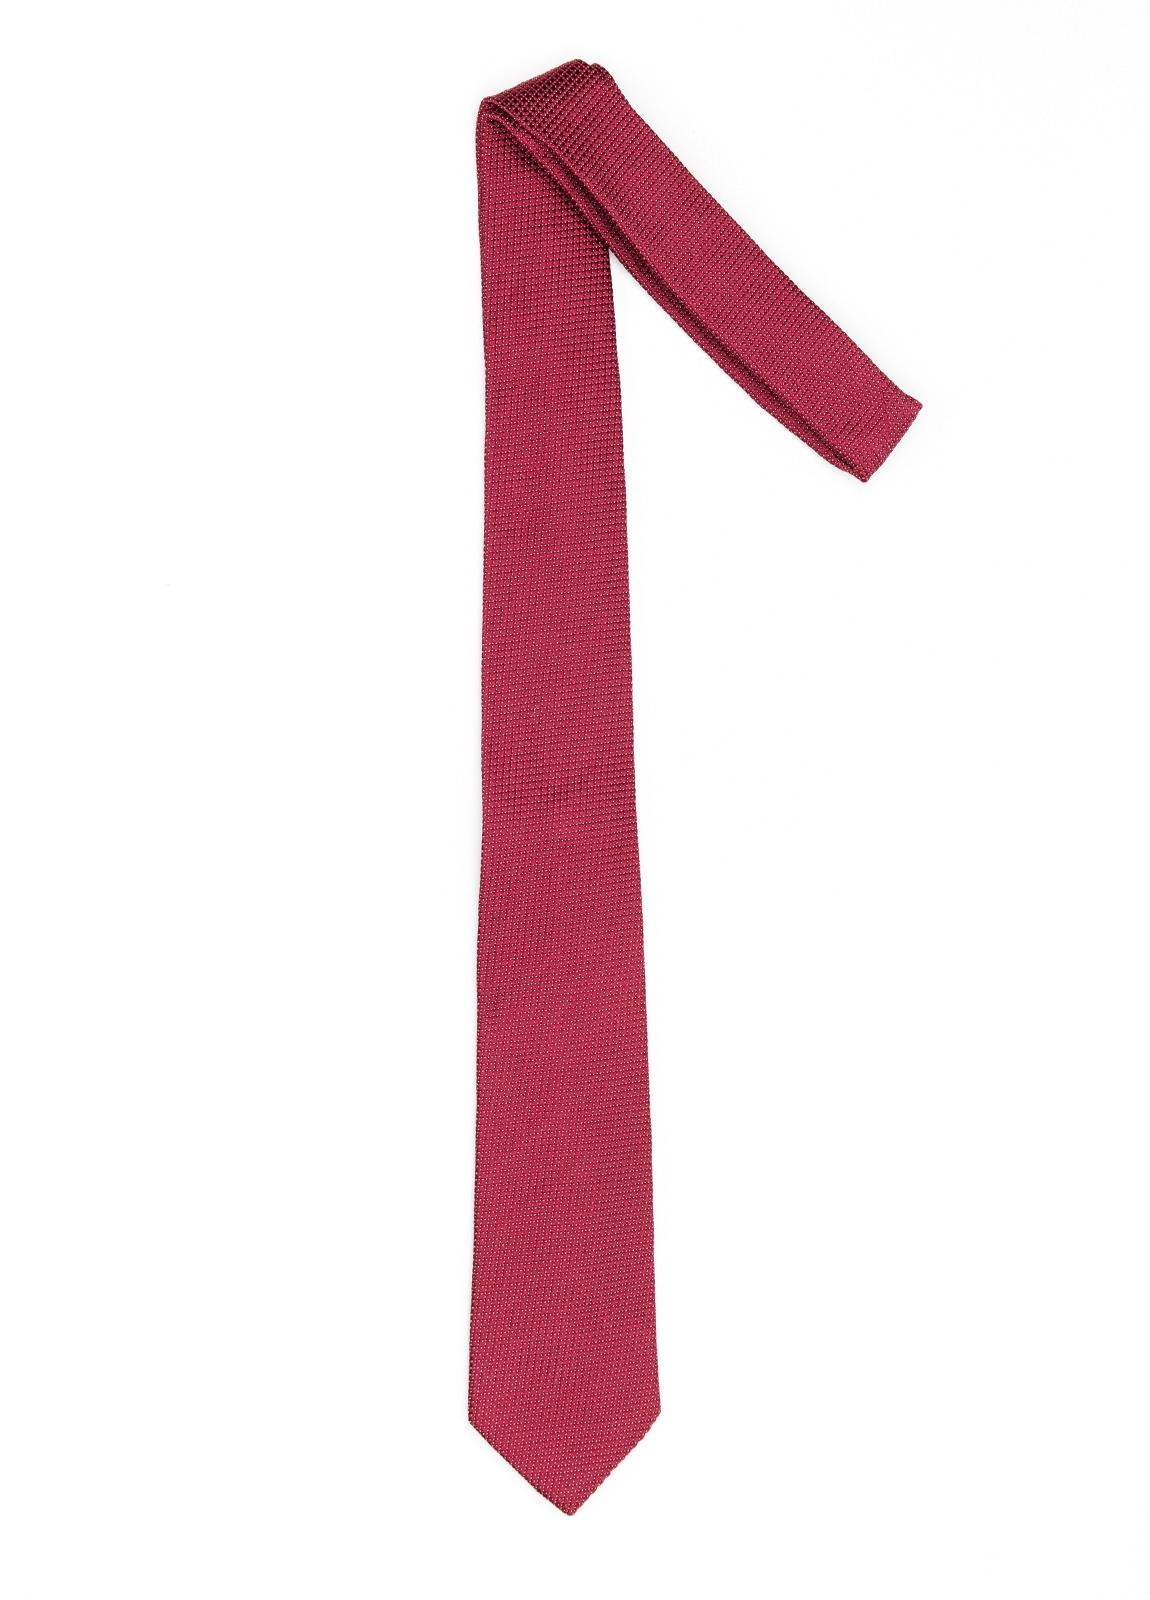 Corbata Formal Wear microtextura color granate. Pala 7,5 cm. 100% Seda. - Ítem1